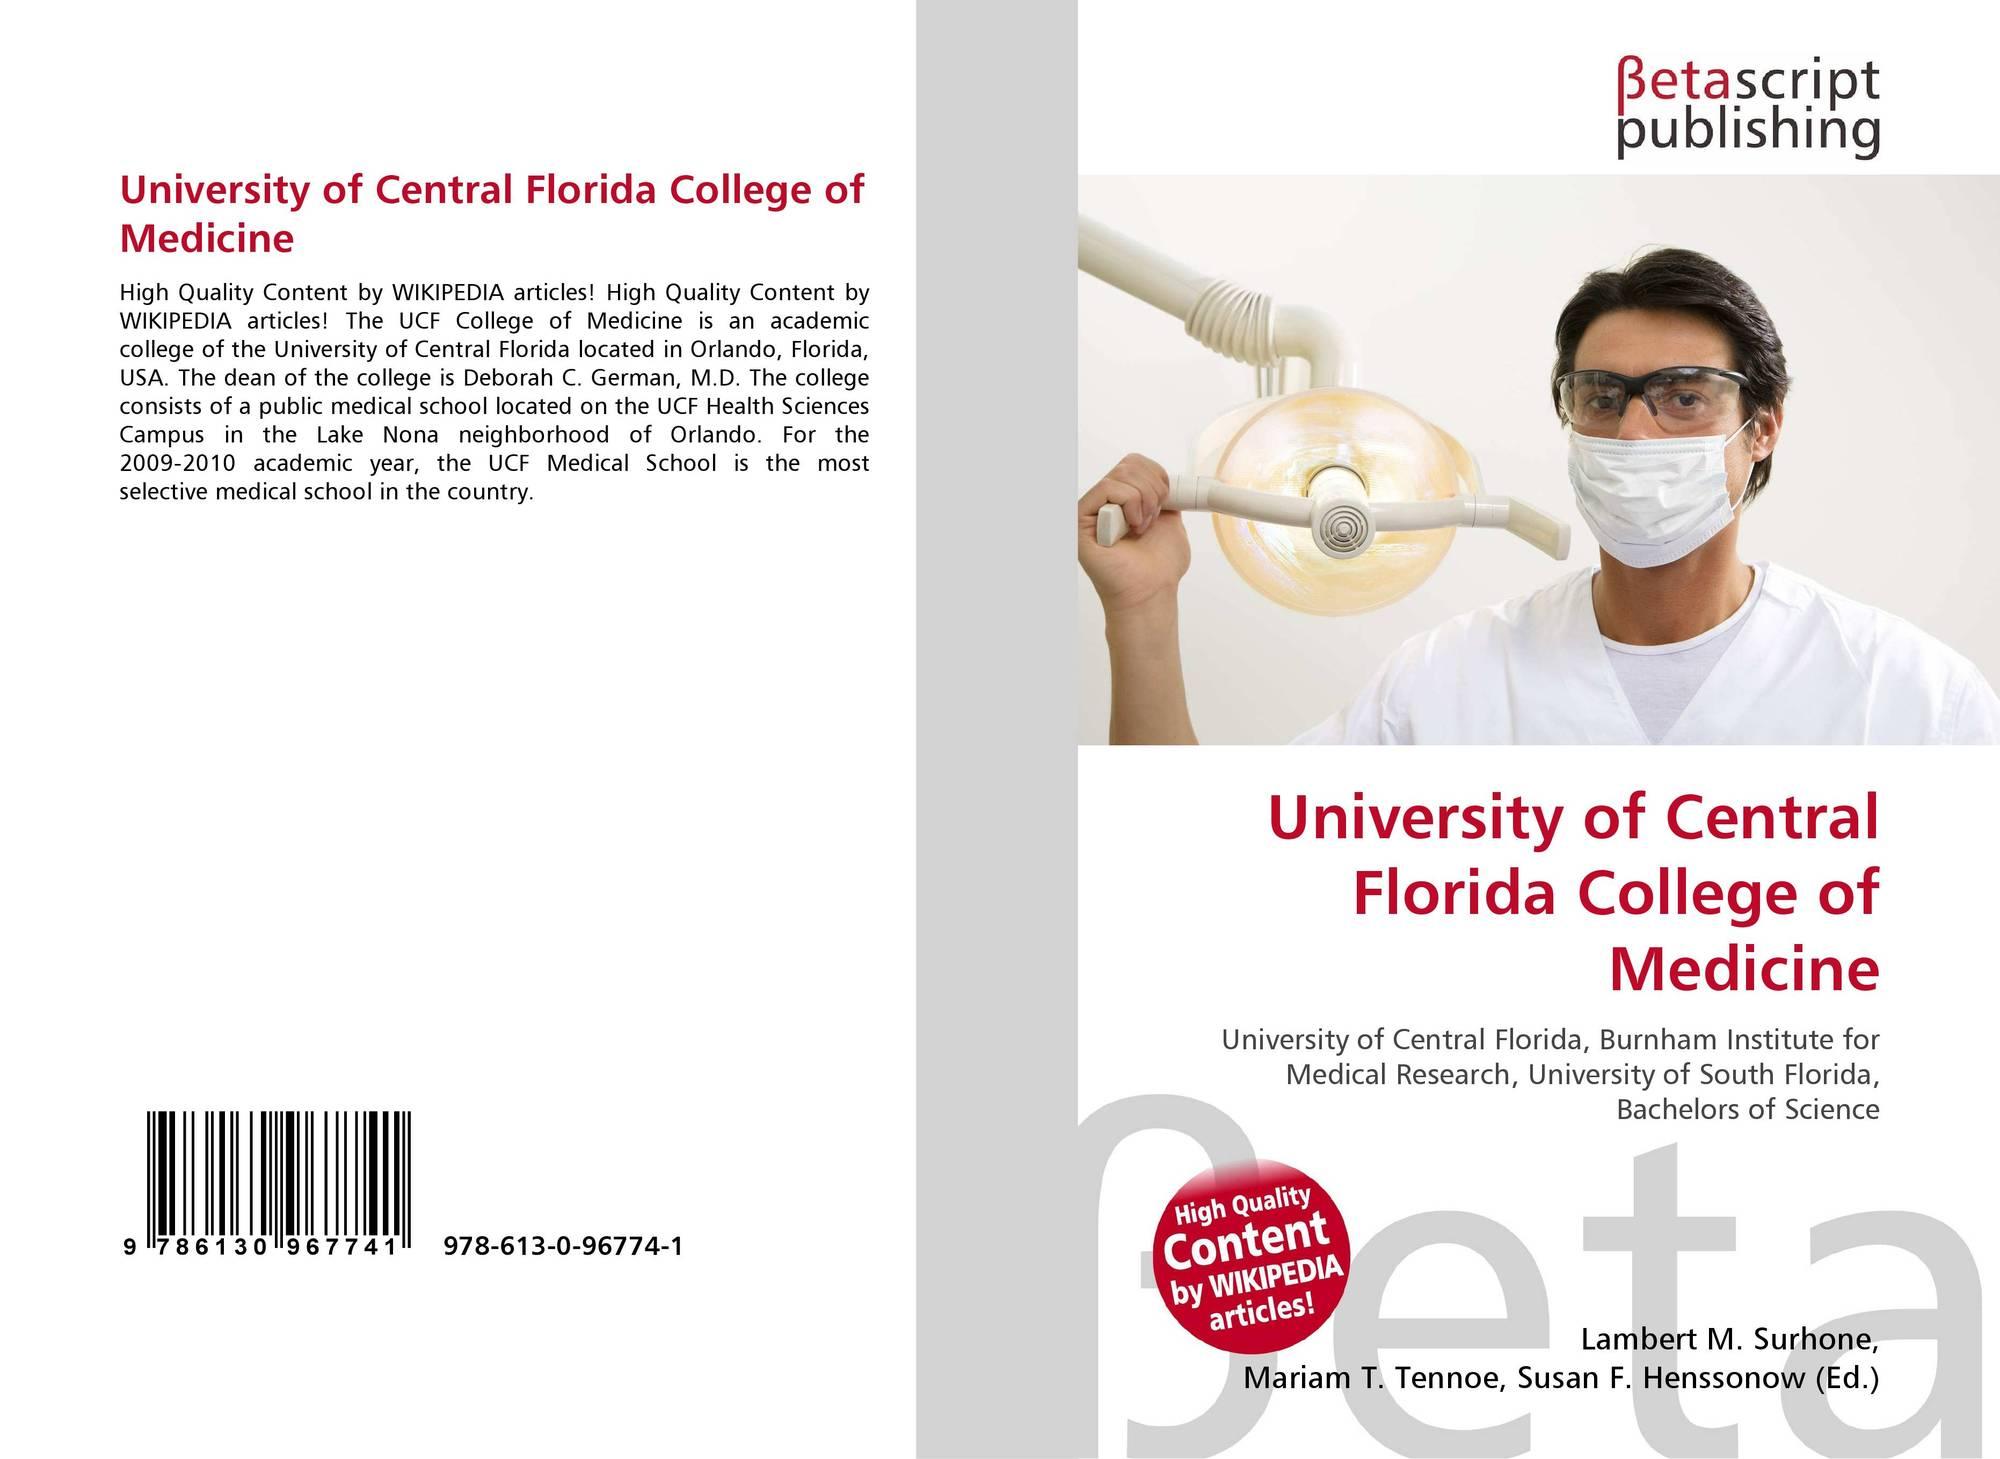 University of Central Florida College of Medicine, 978-613-0